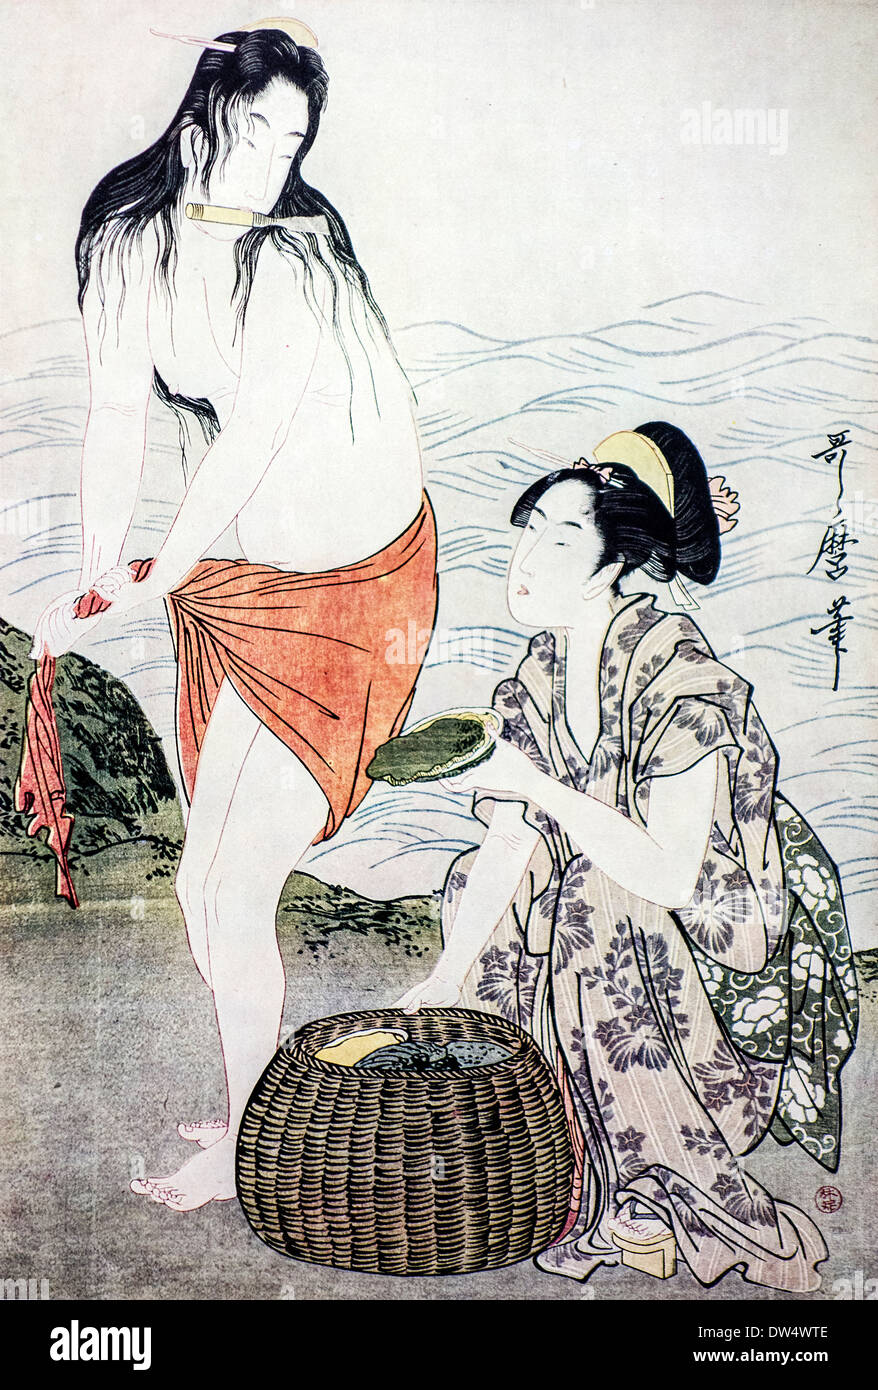 Ukiyo-e woodblock print of The Awabi Fishers by Japanese artist Kitagawa Utamaro, Japan - Stock Image